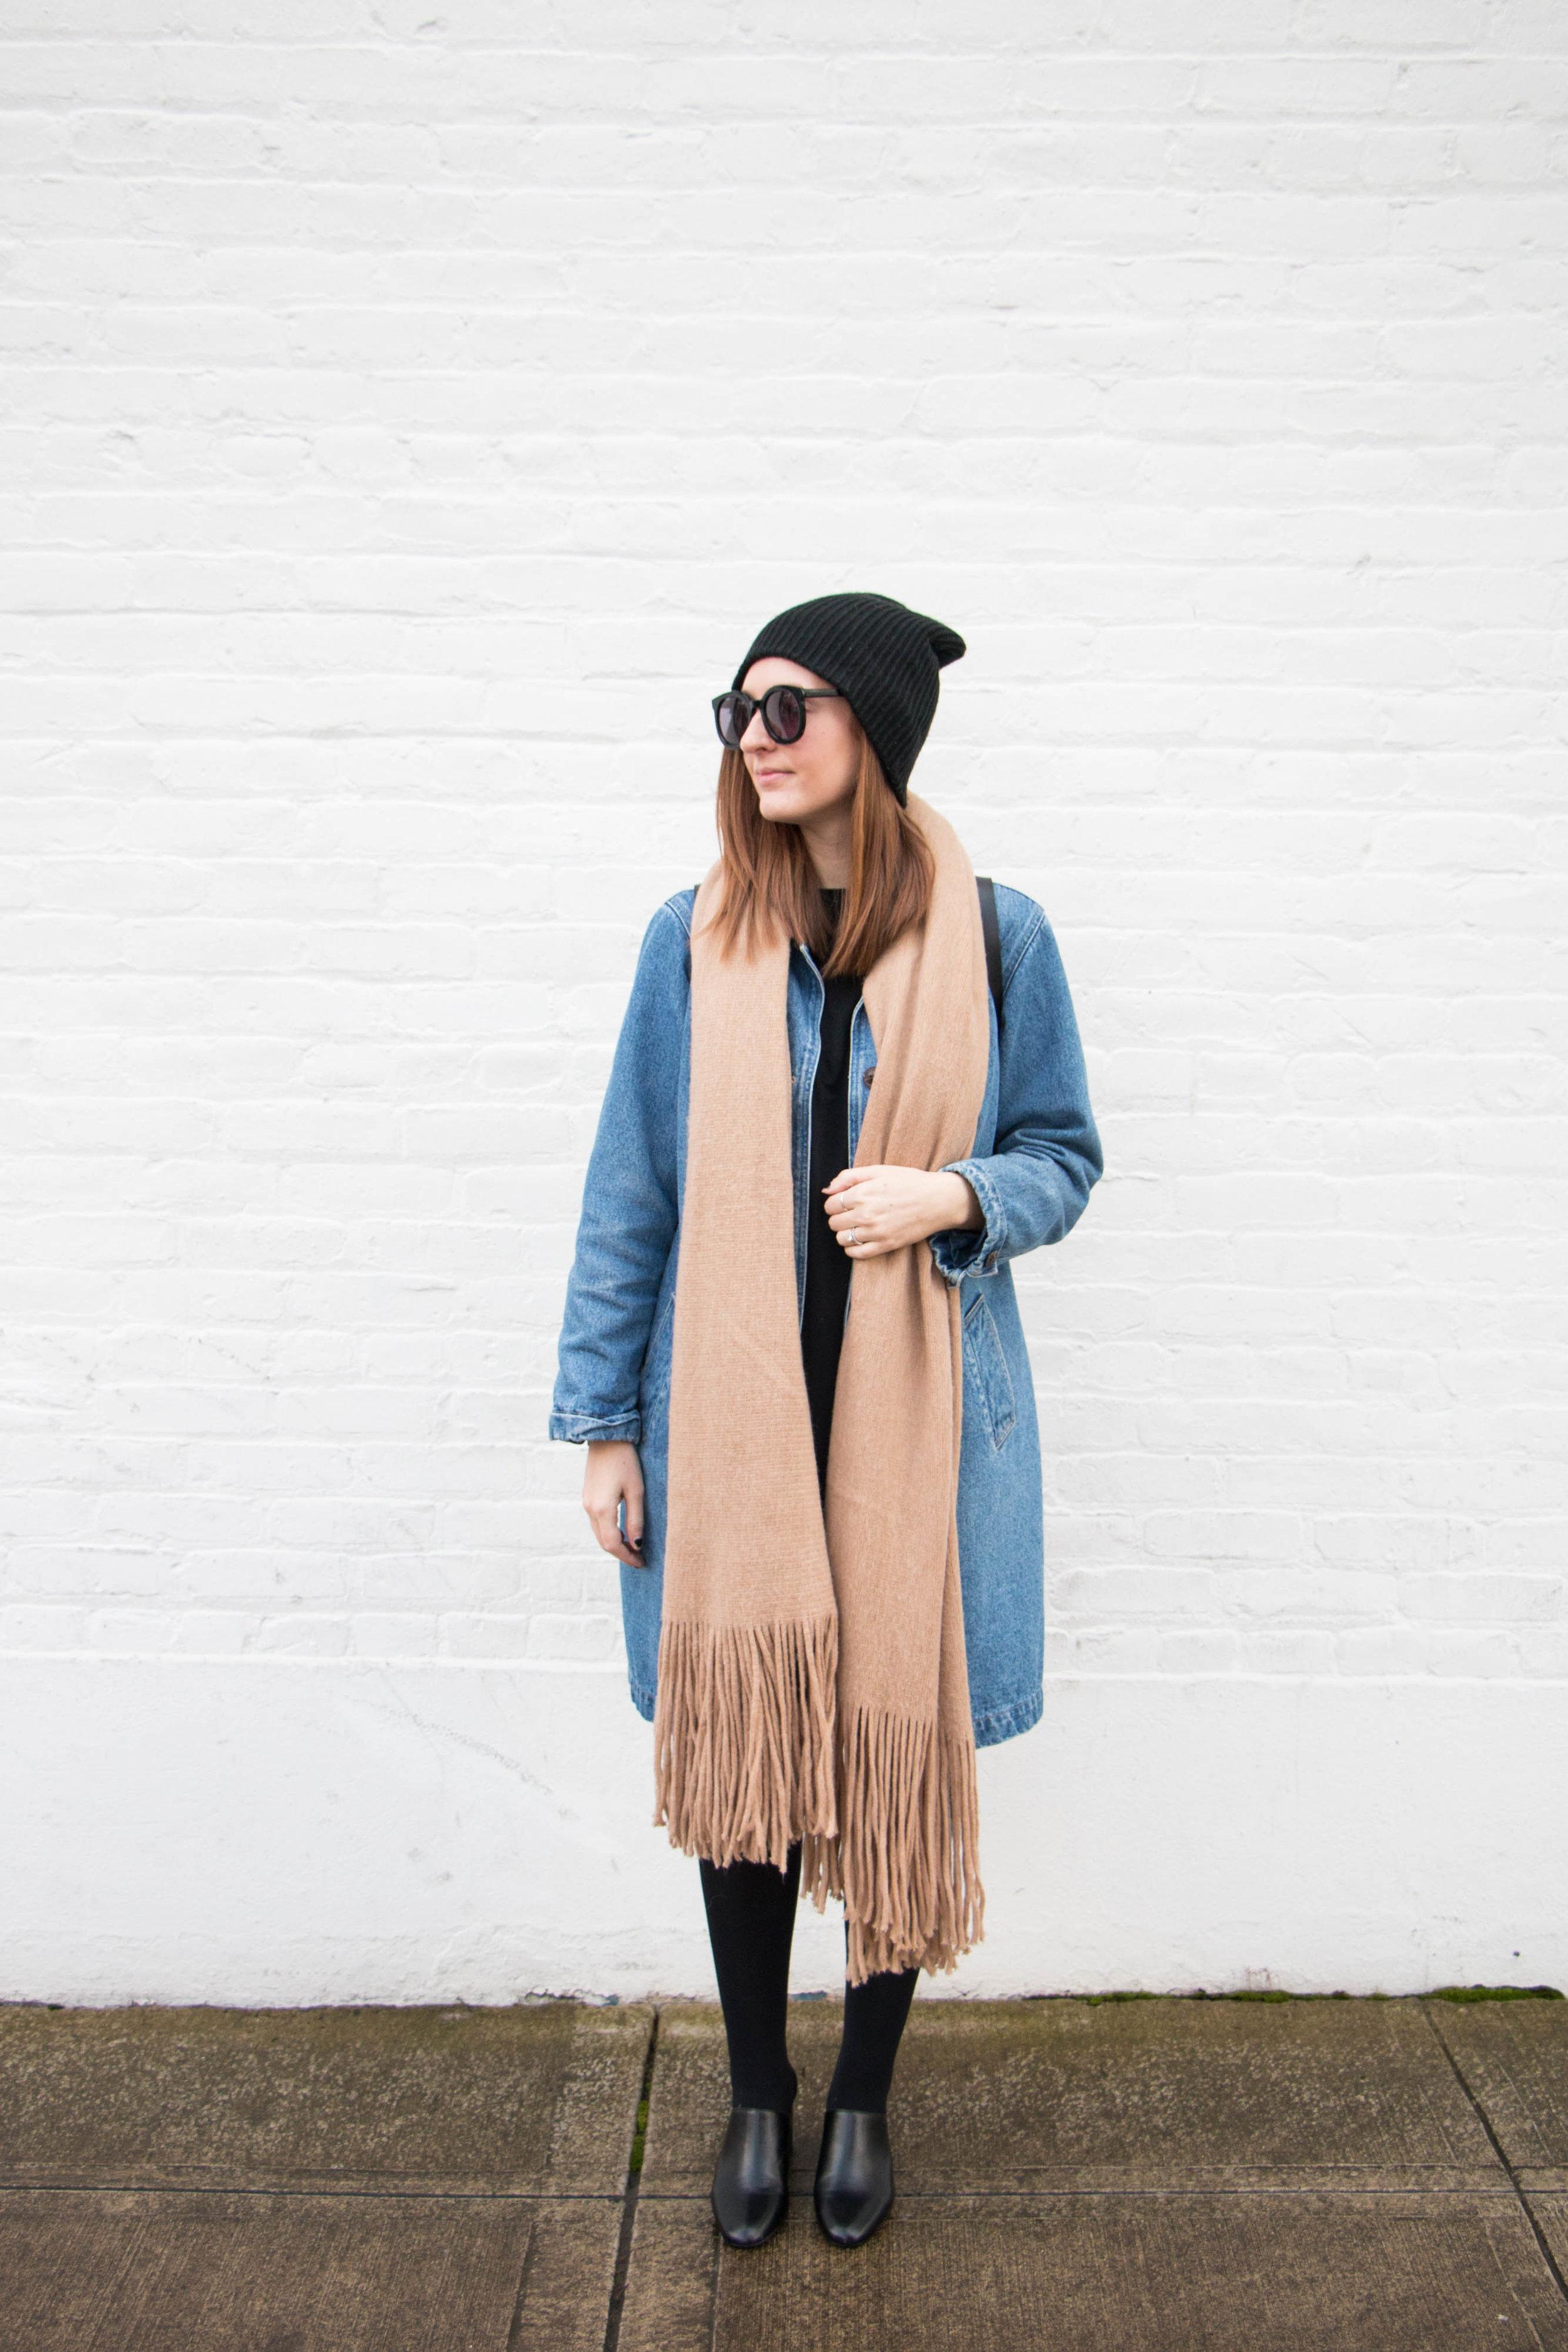 the-thoughtful-closet_winter-10-x-10_look-2_-3.jpg